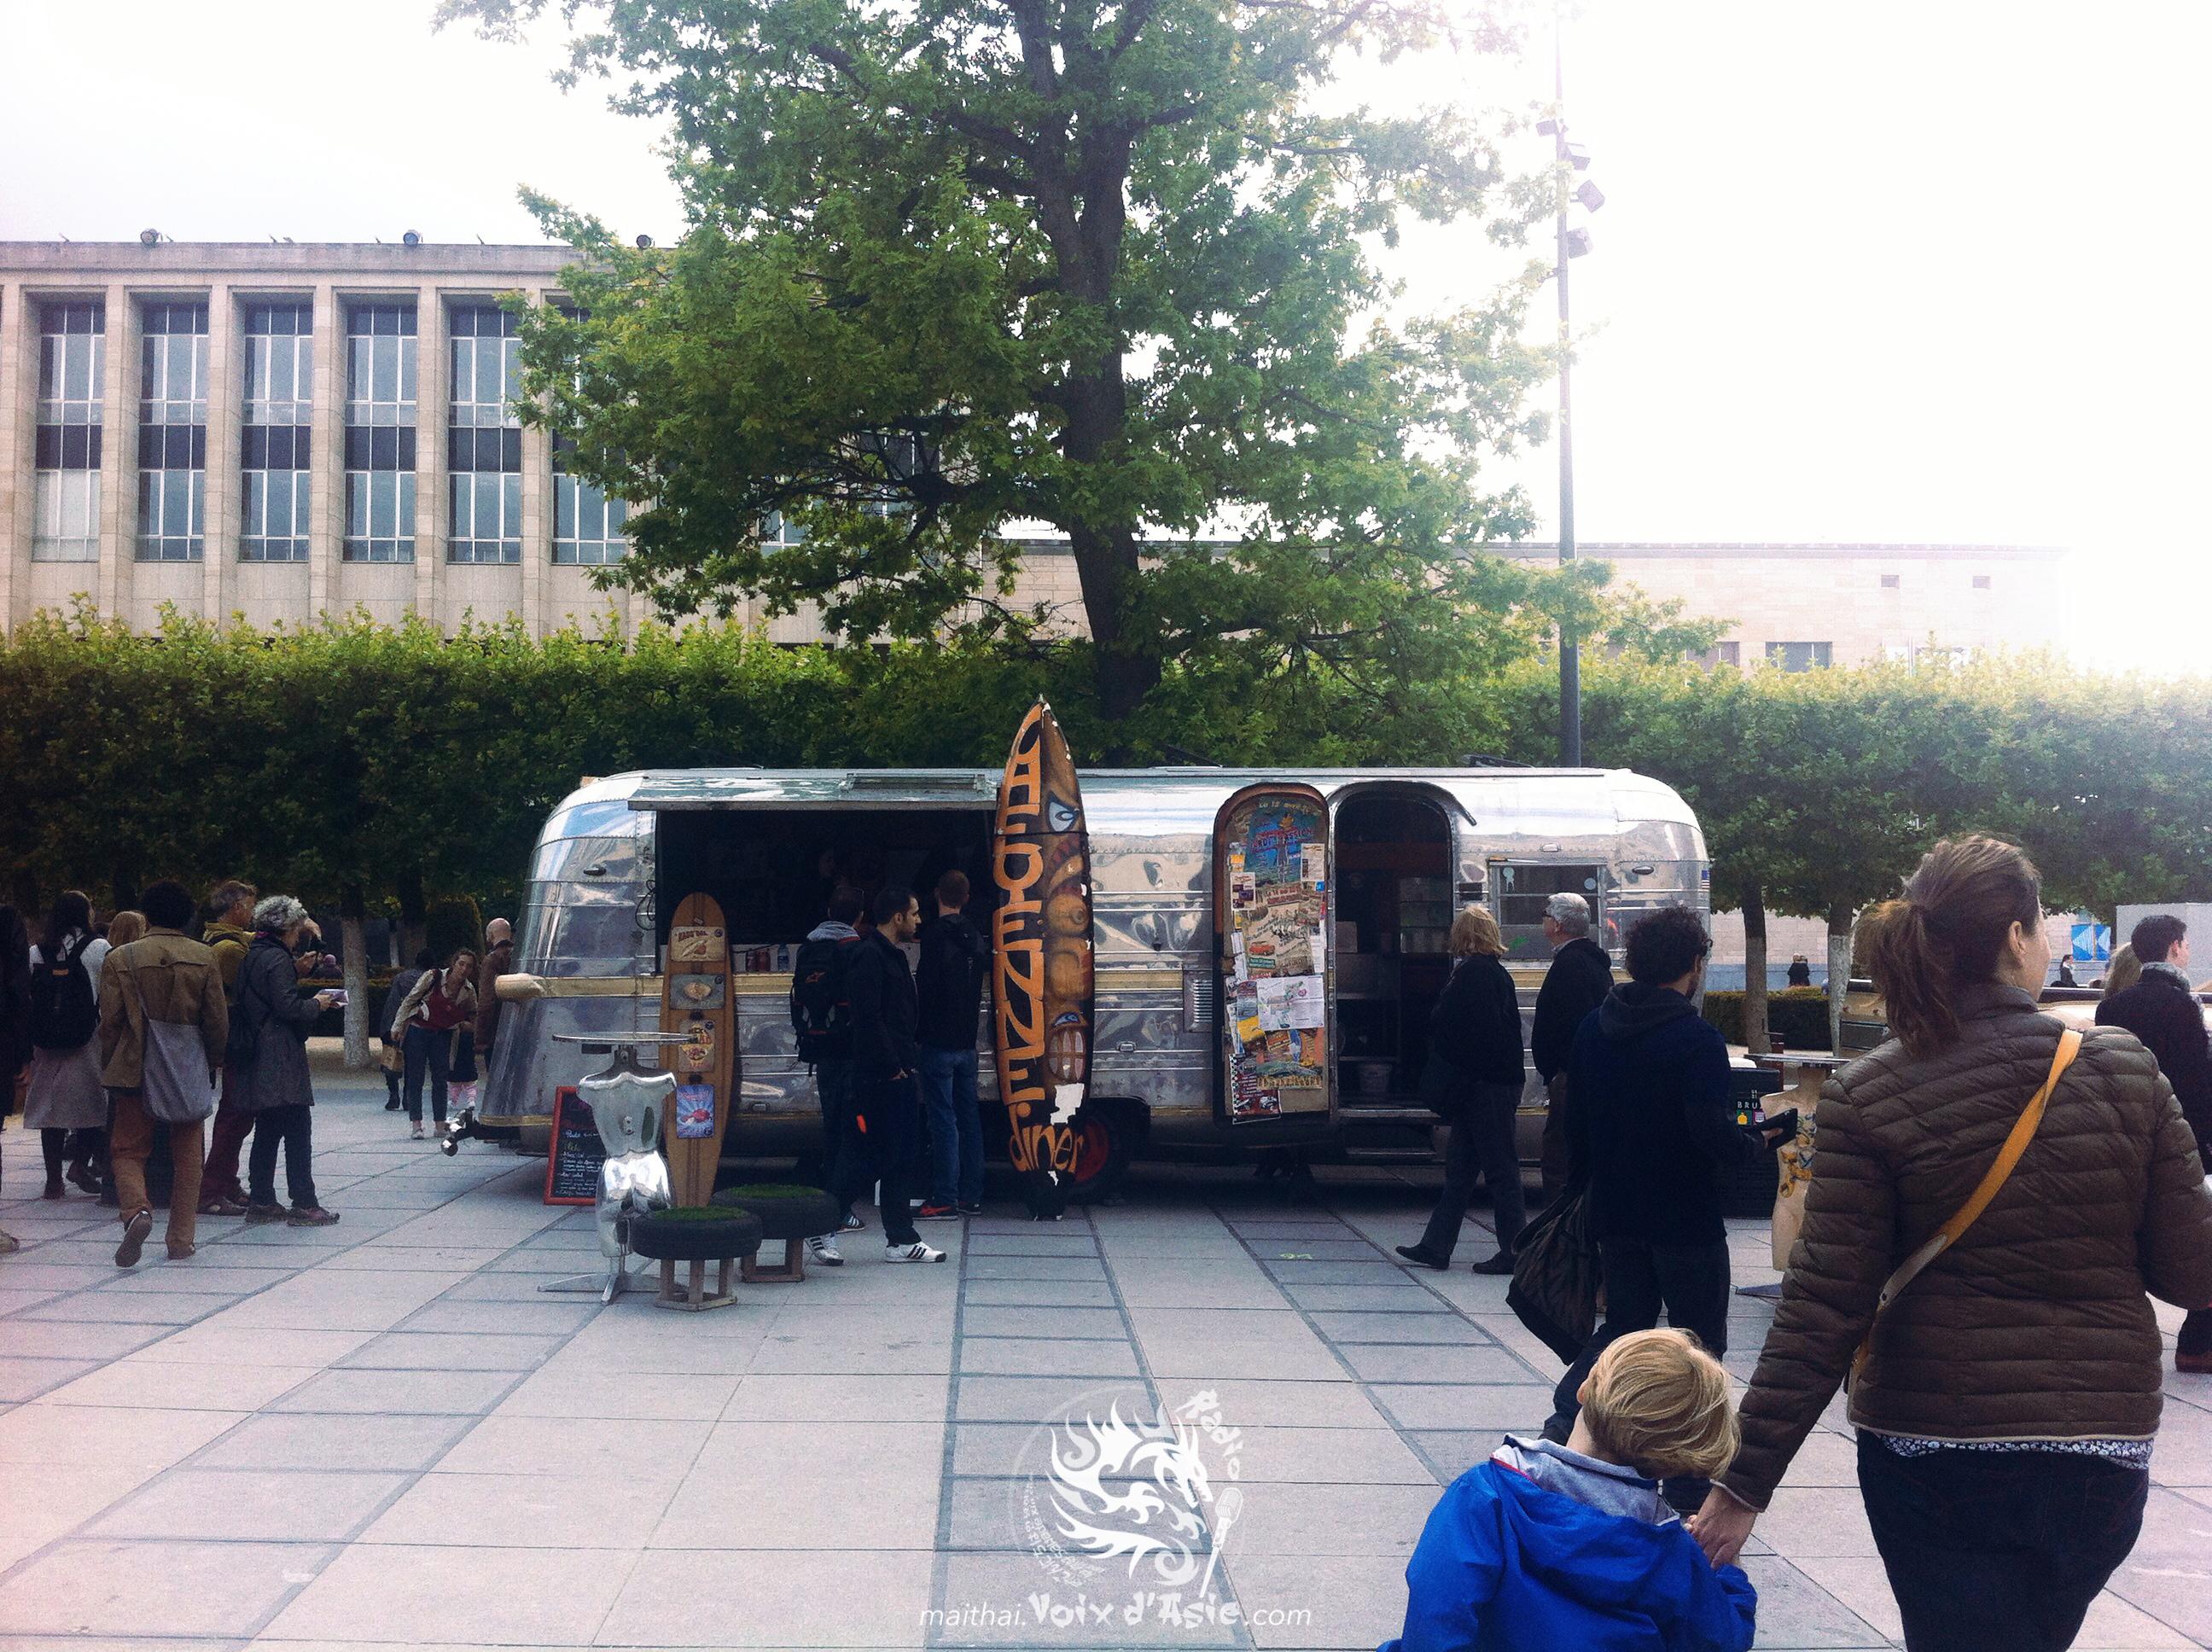 Brussels Foodtruck Festival 2015 |